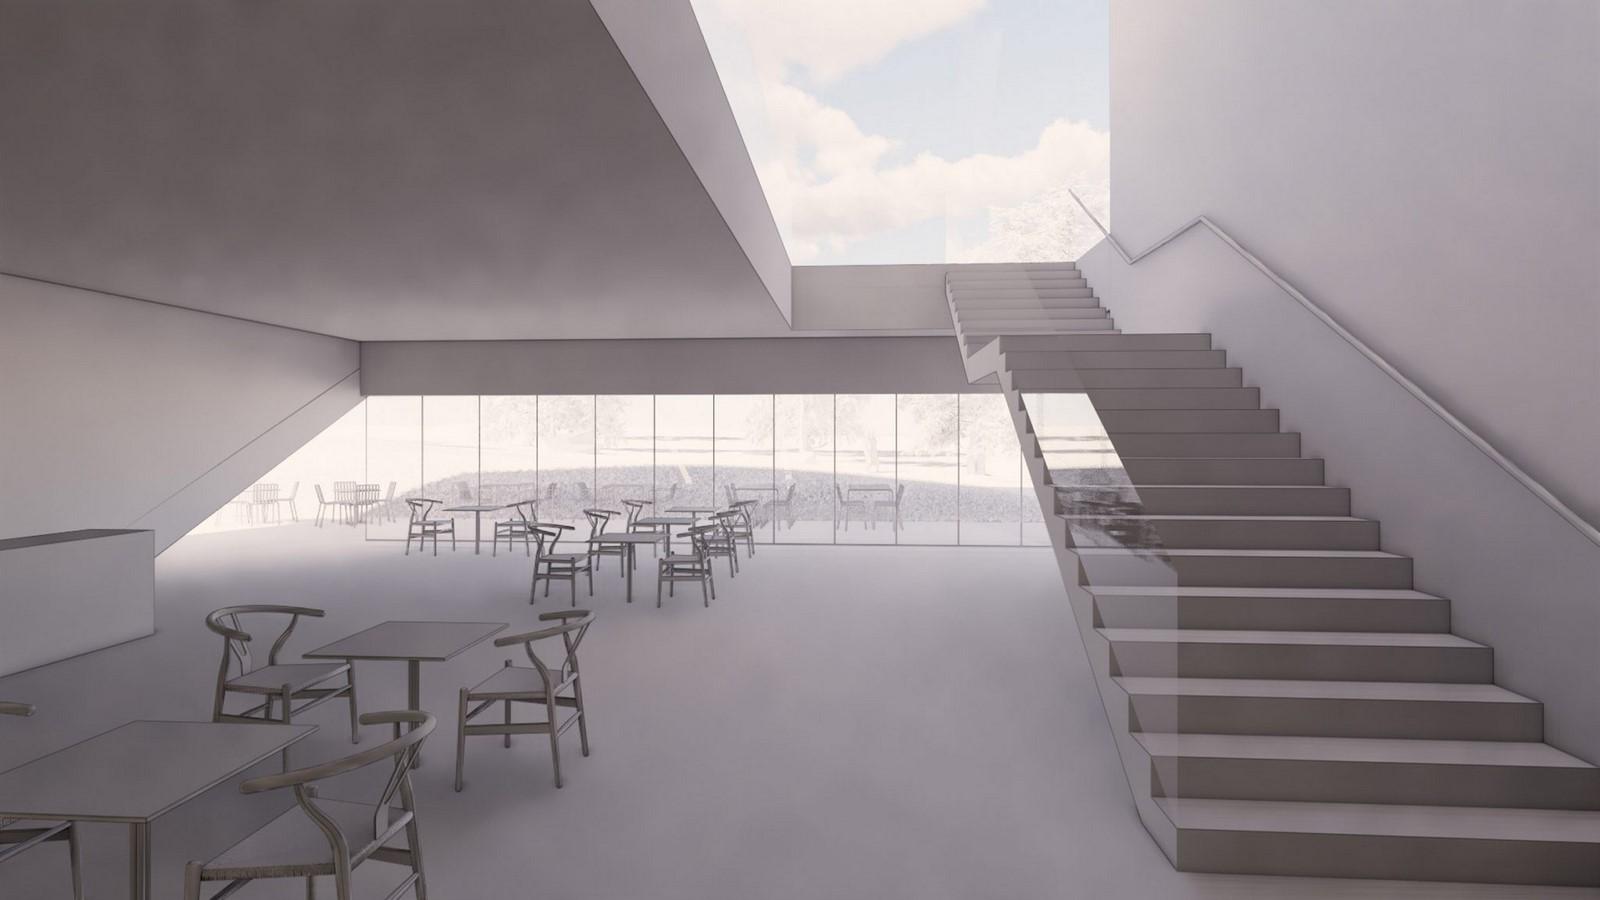 Sky-facing auditorium to Kon-Tiki Museum in Oslo to be added by Snøhetta - Sheet8